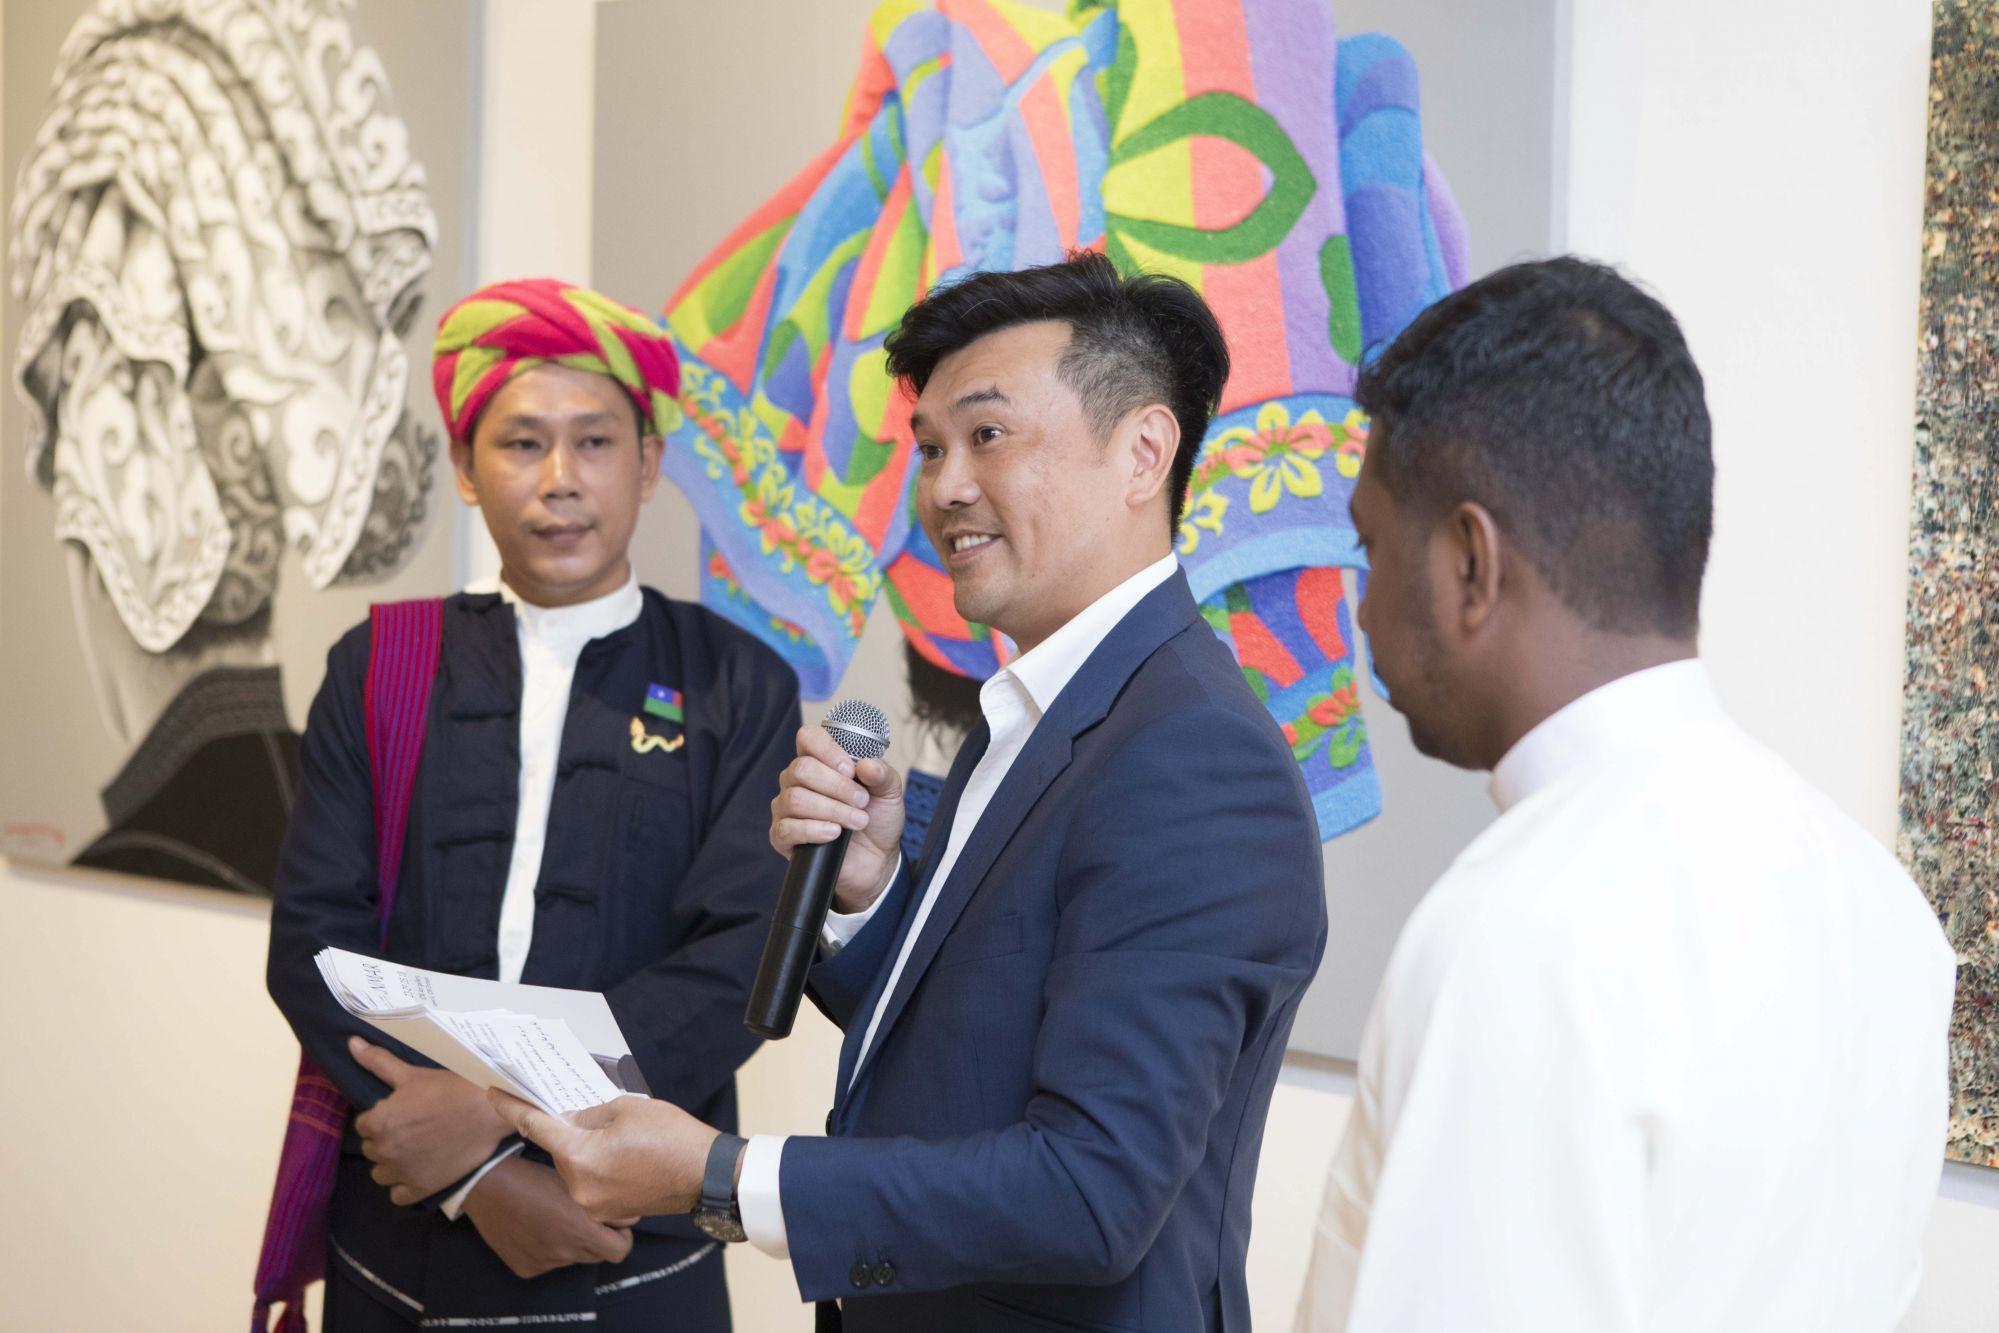 Moe Myint Zaw, Gerald Lee, Zin Min